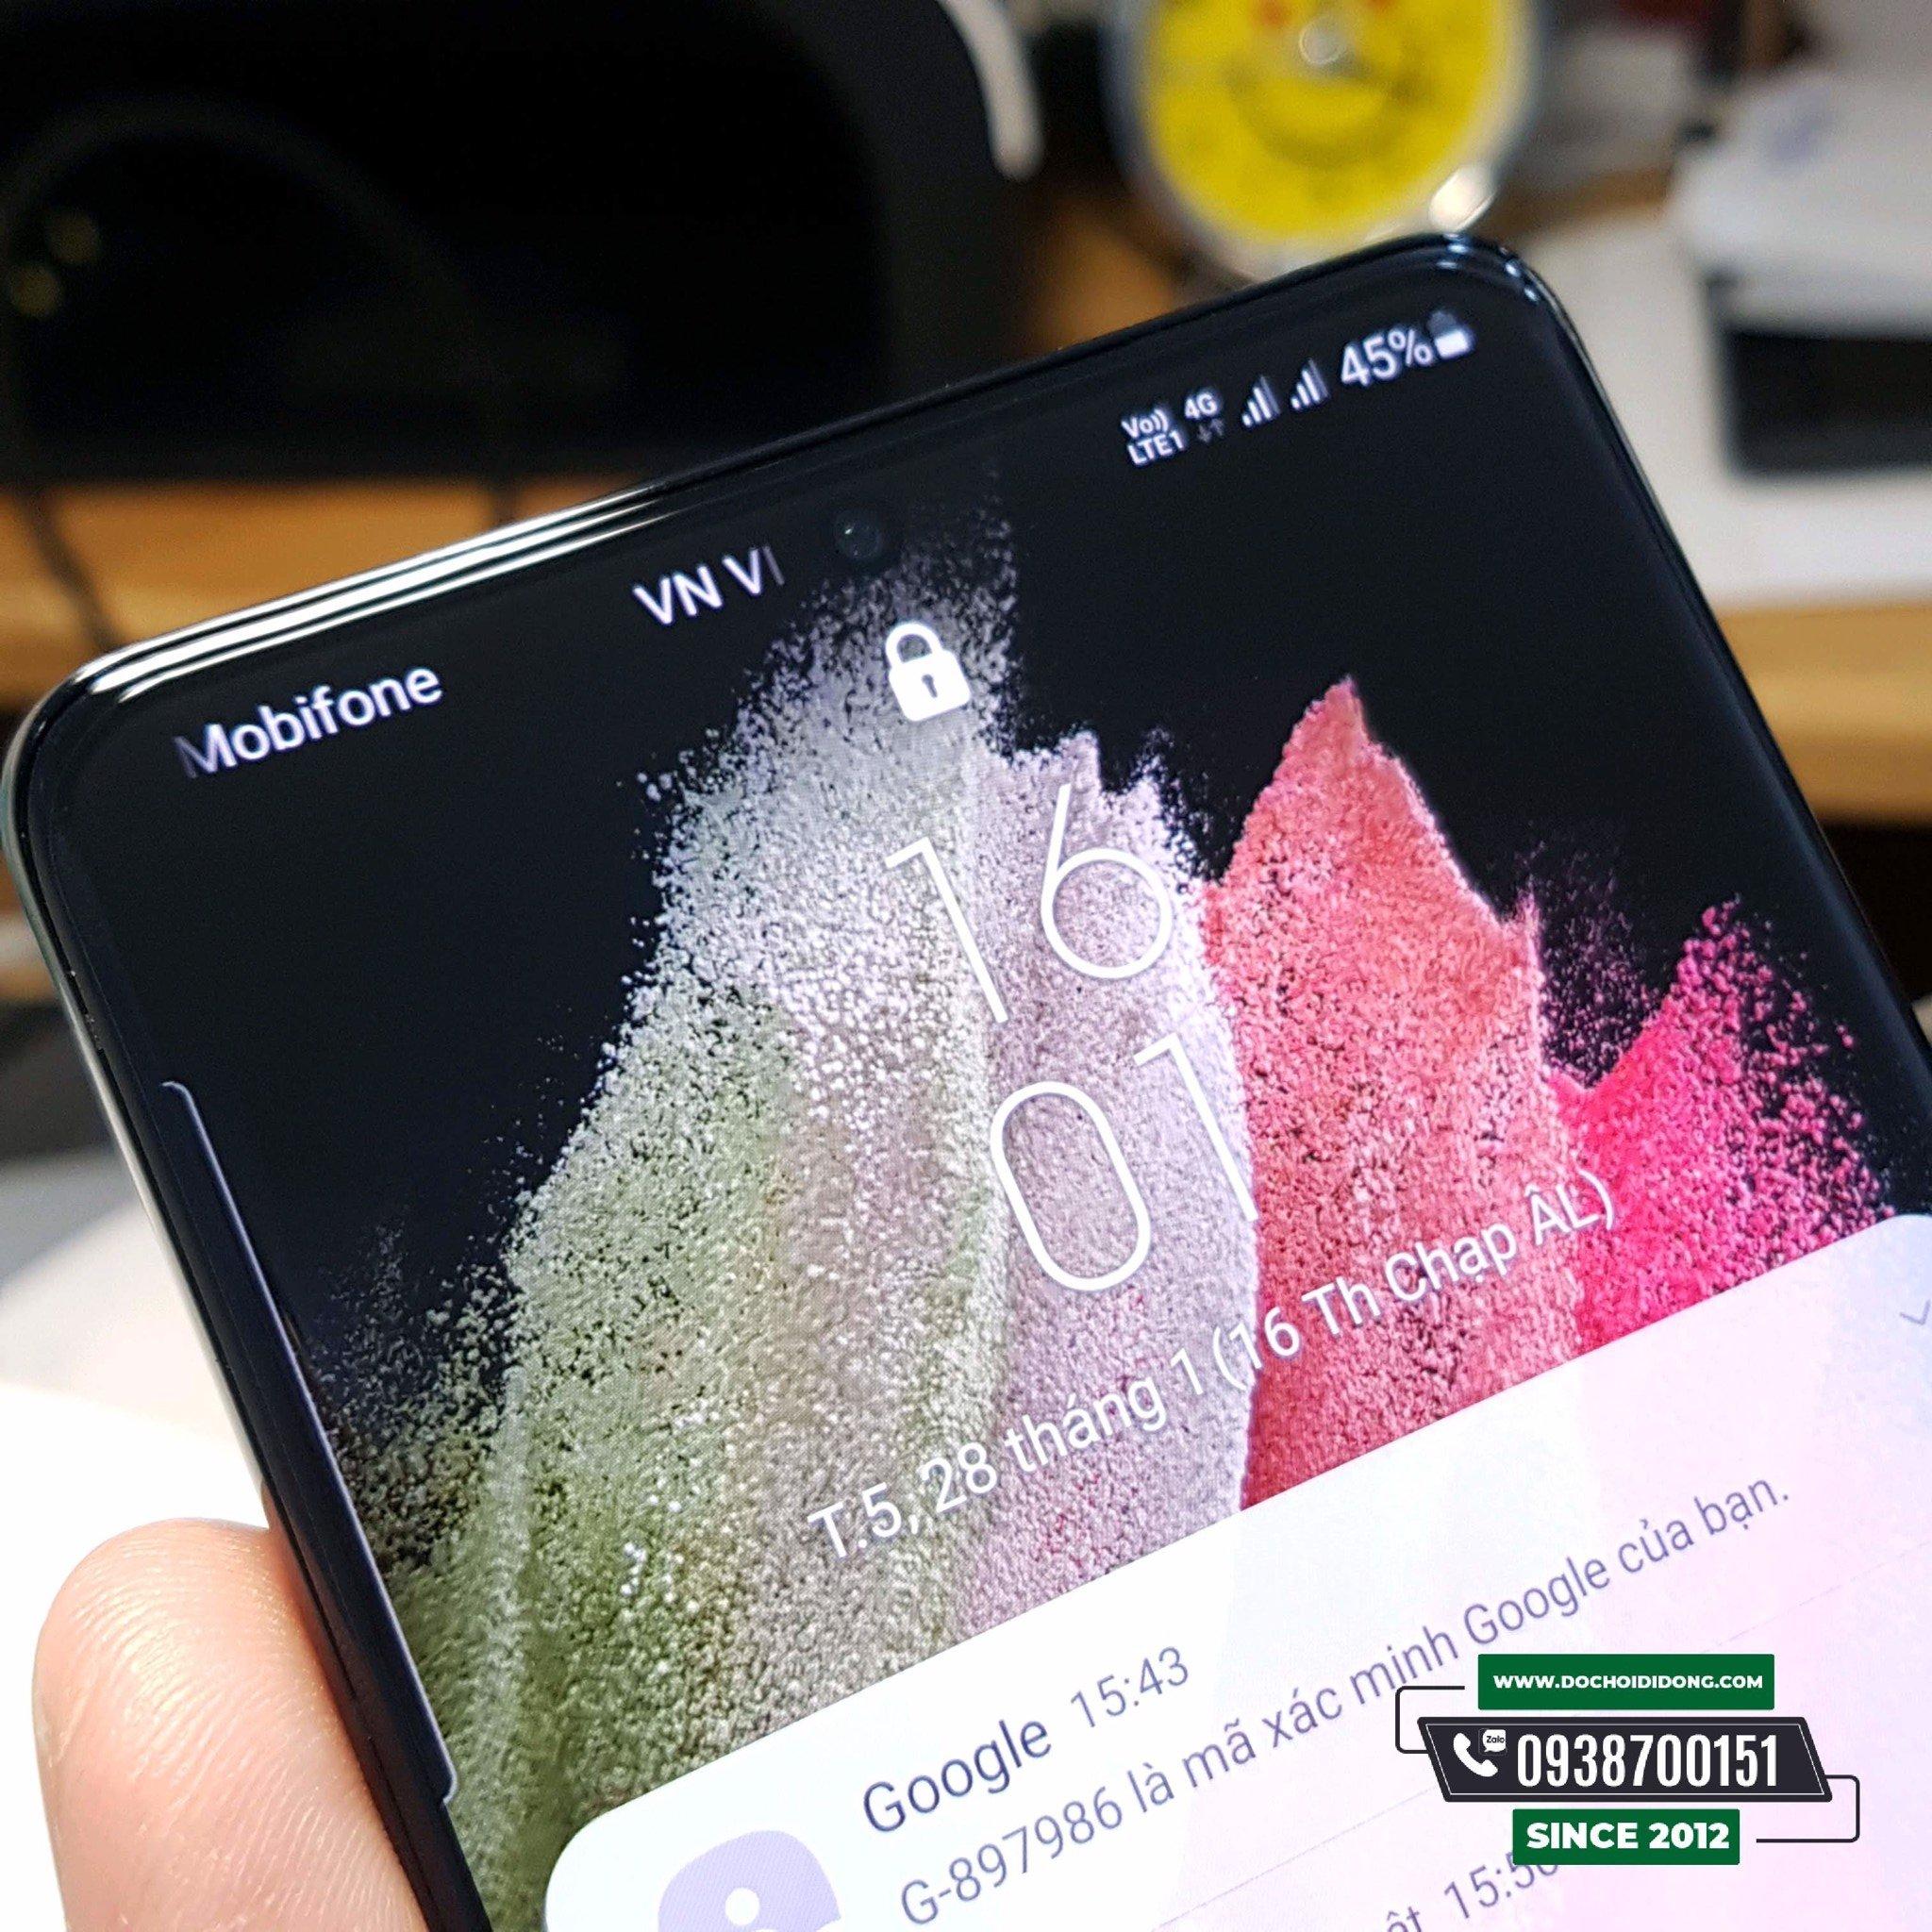 Miếng dán cường lực Samsung S21 Plus + Ultra 5G Zacase keo UV cao cấp